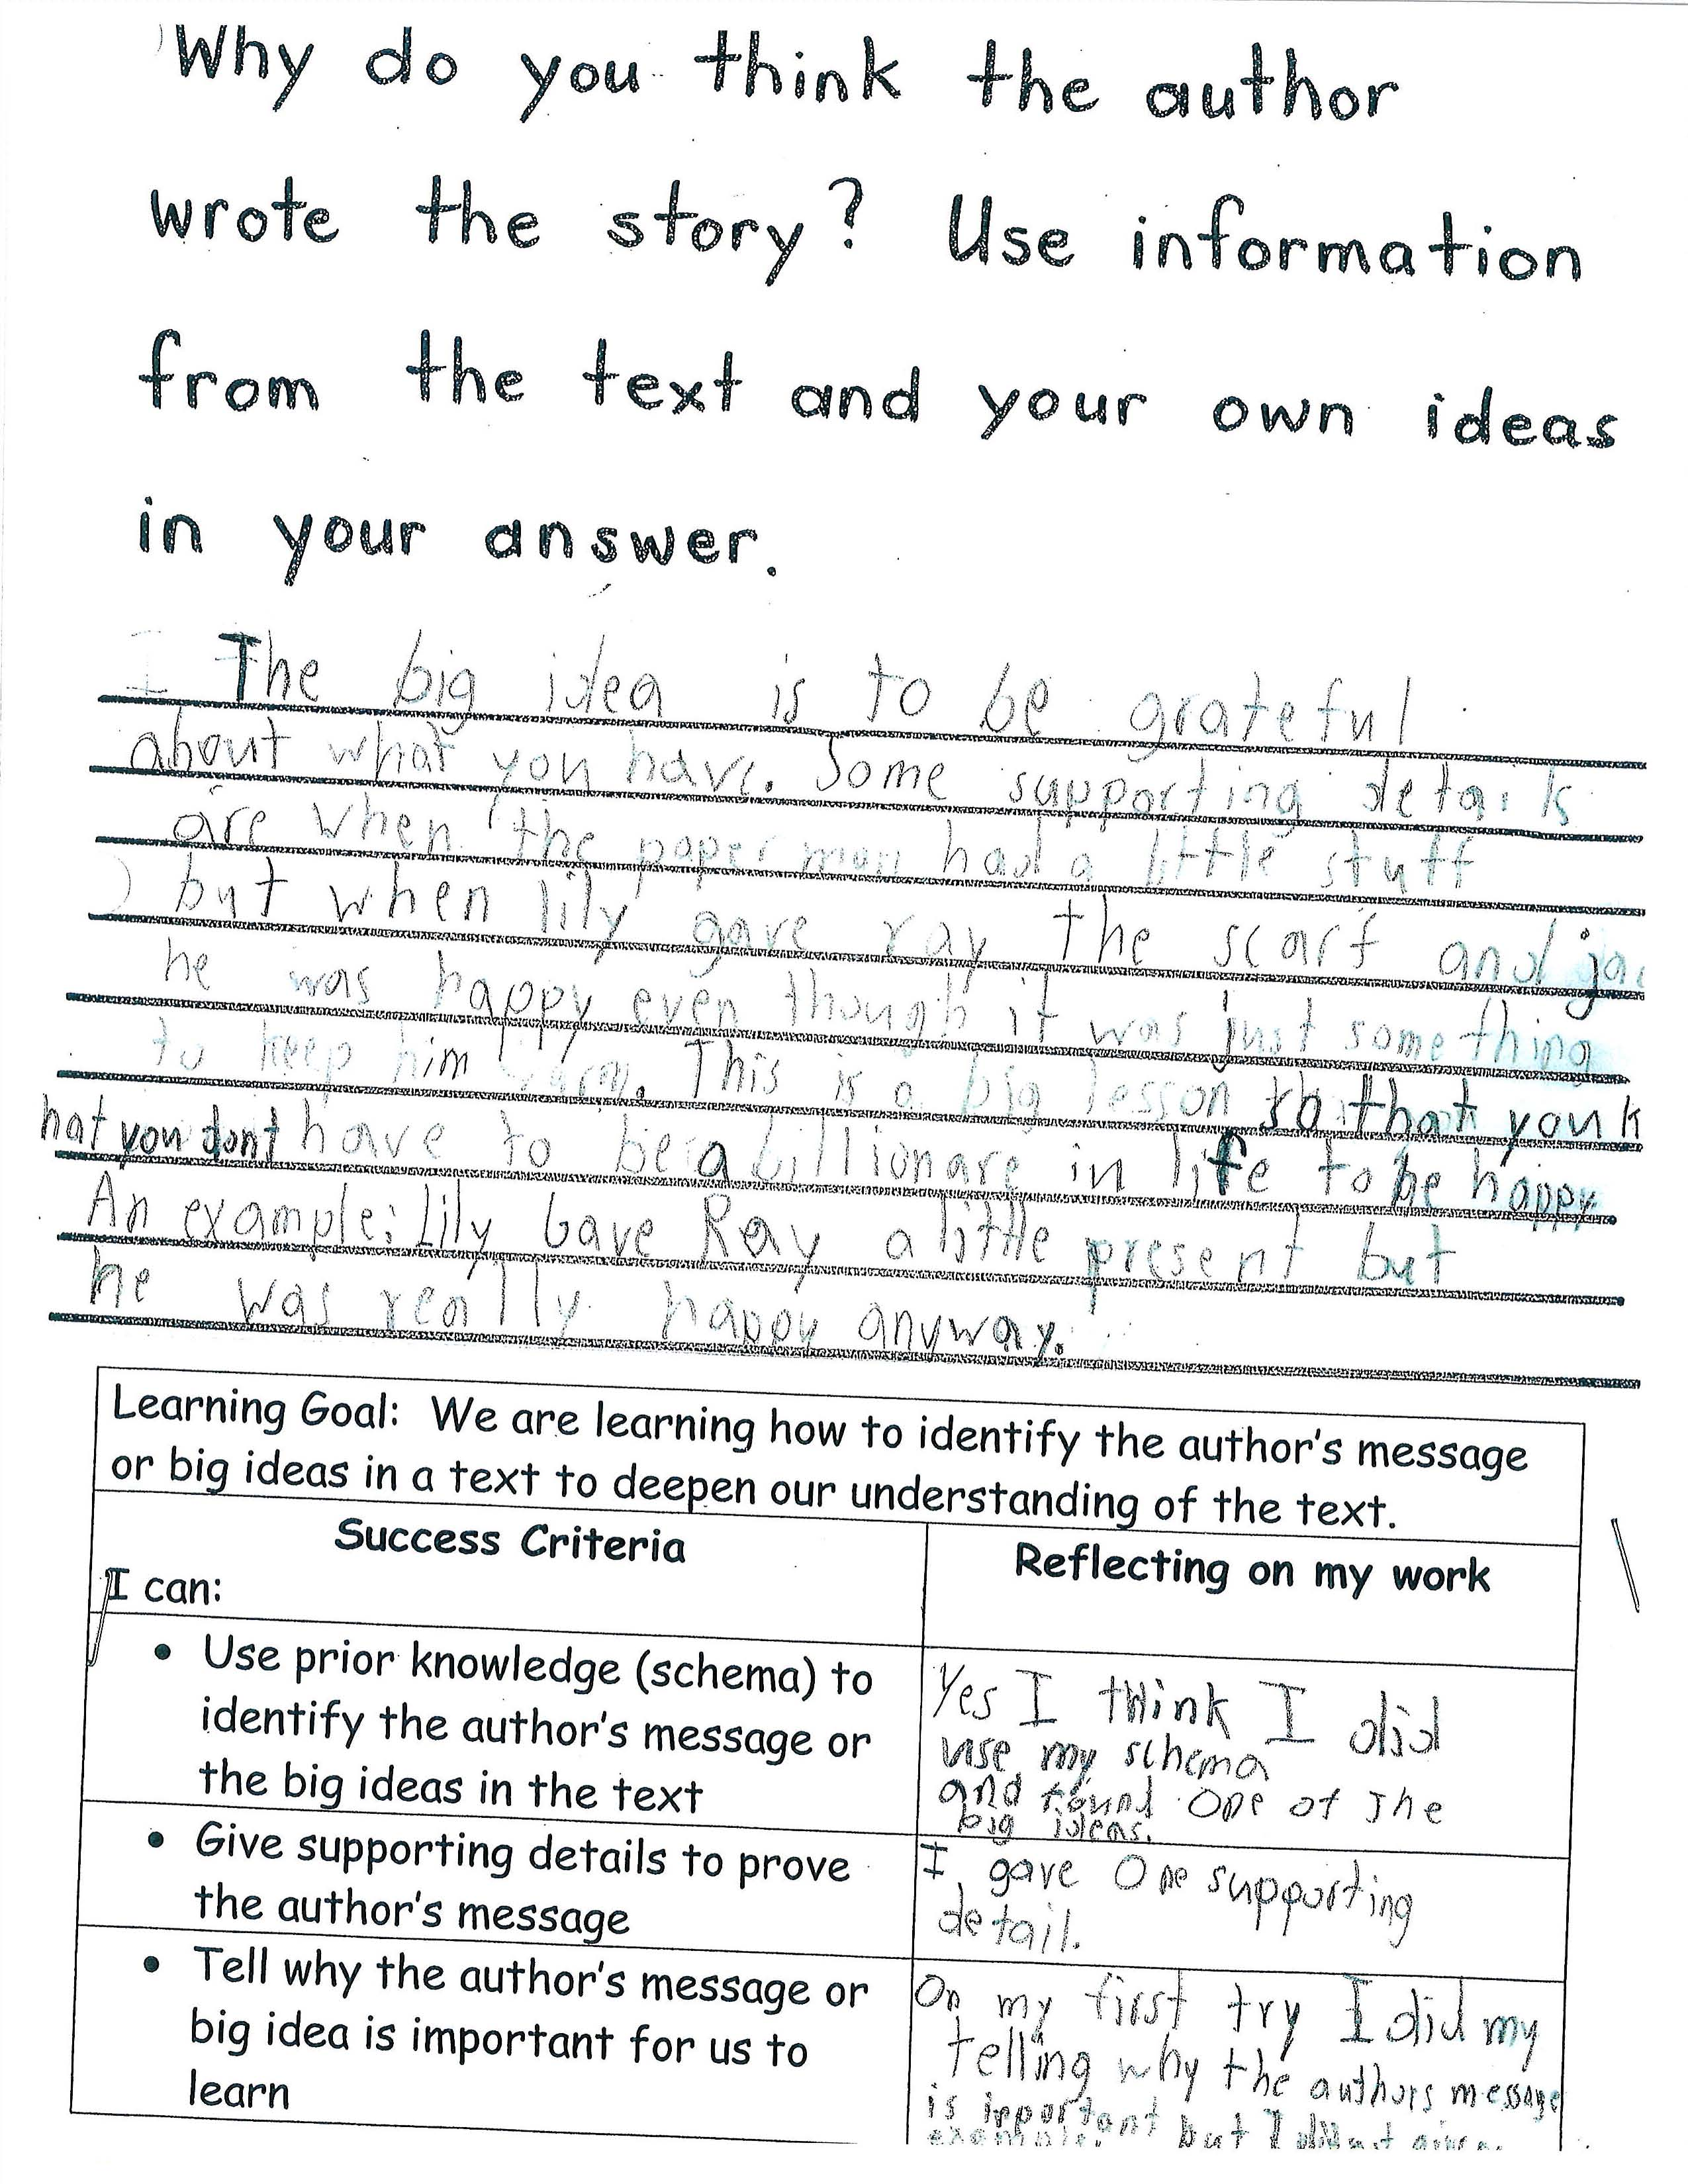 008 English Reflective Essay Example Awesome Self Awareness